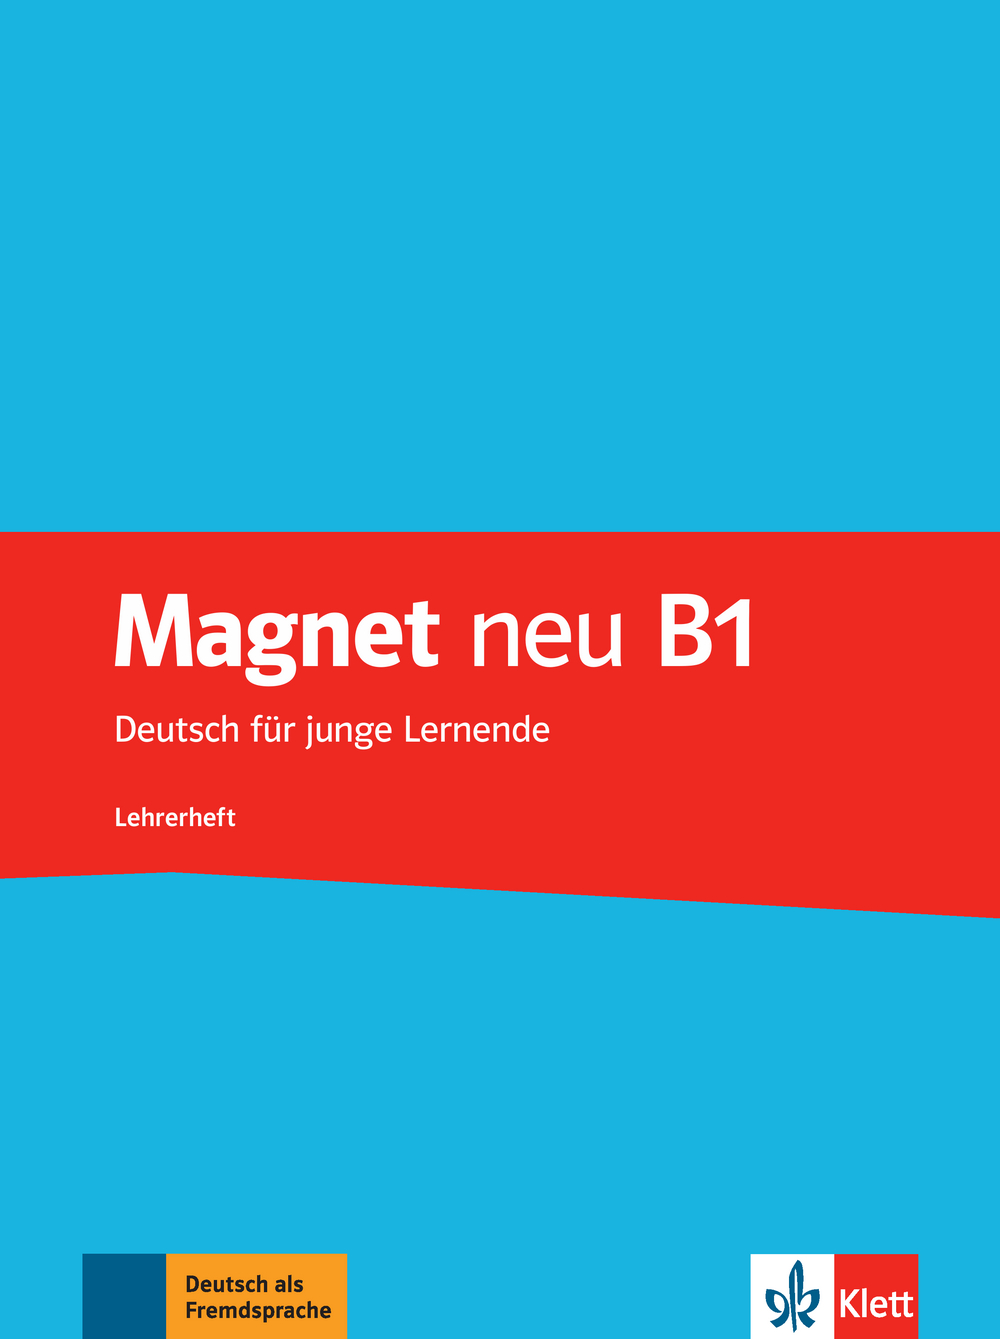 Magnet neu B1